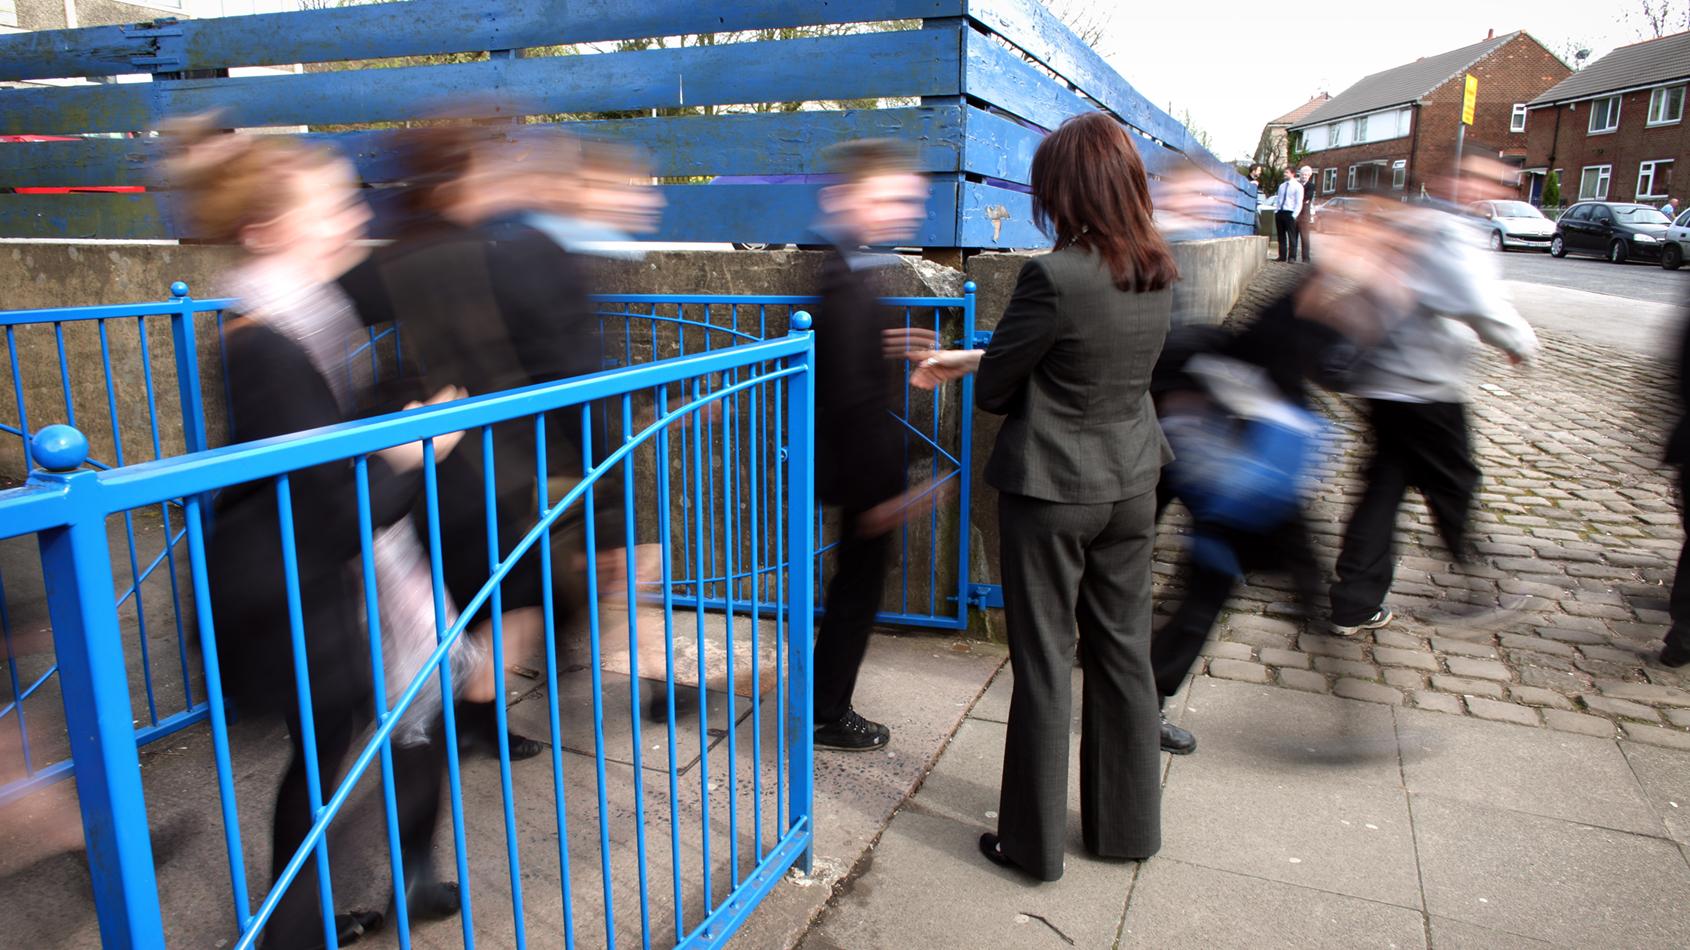 School gate Covid